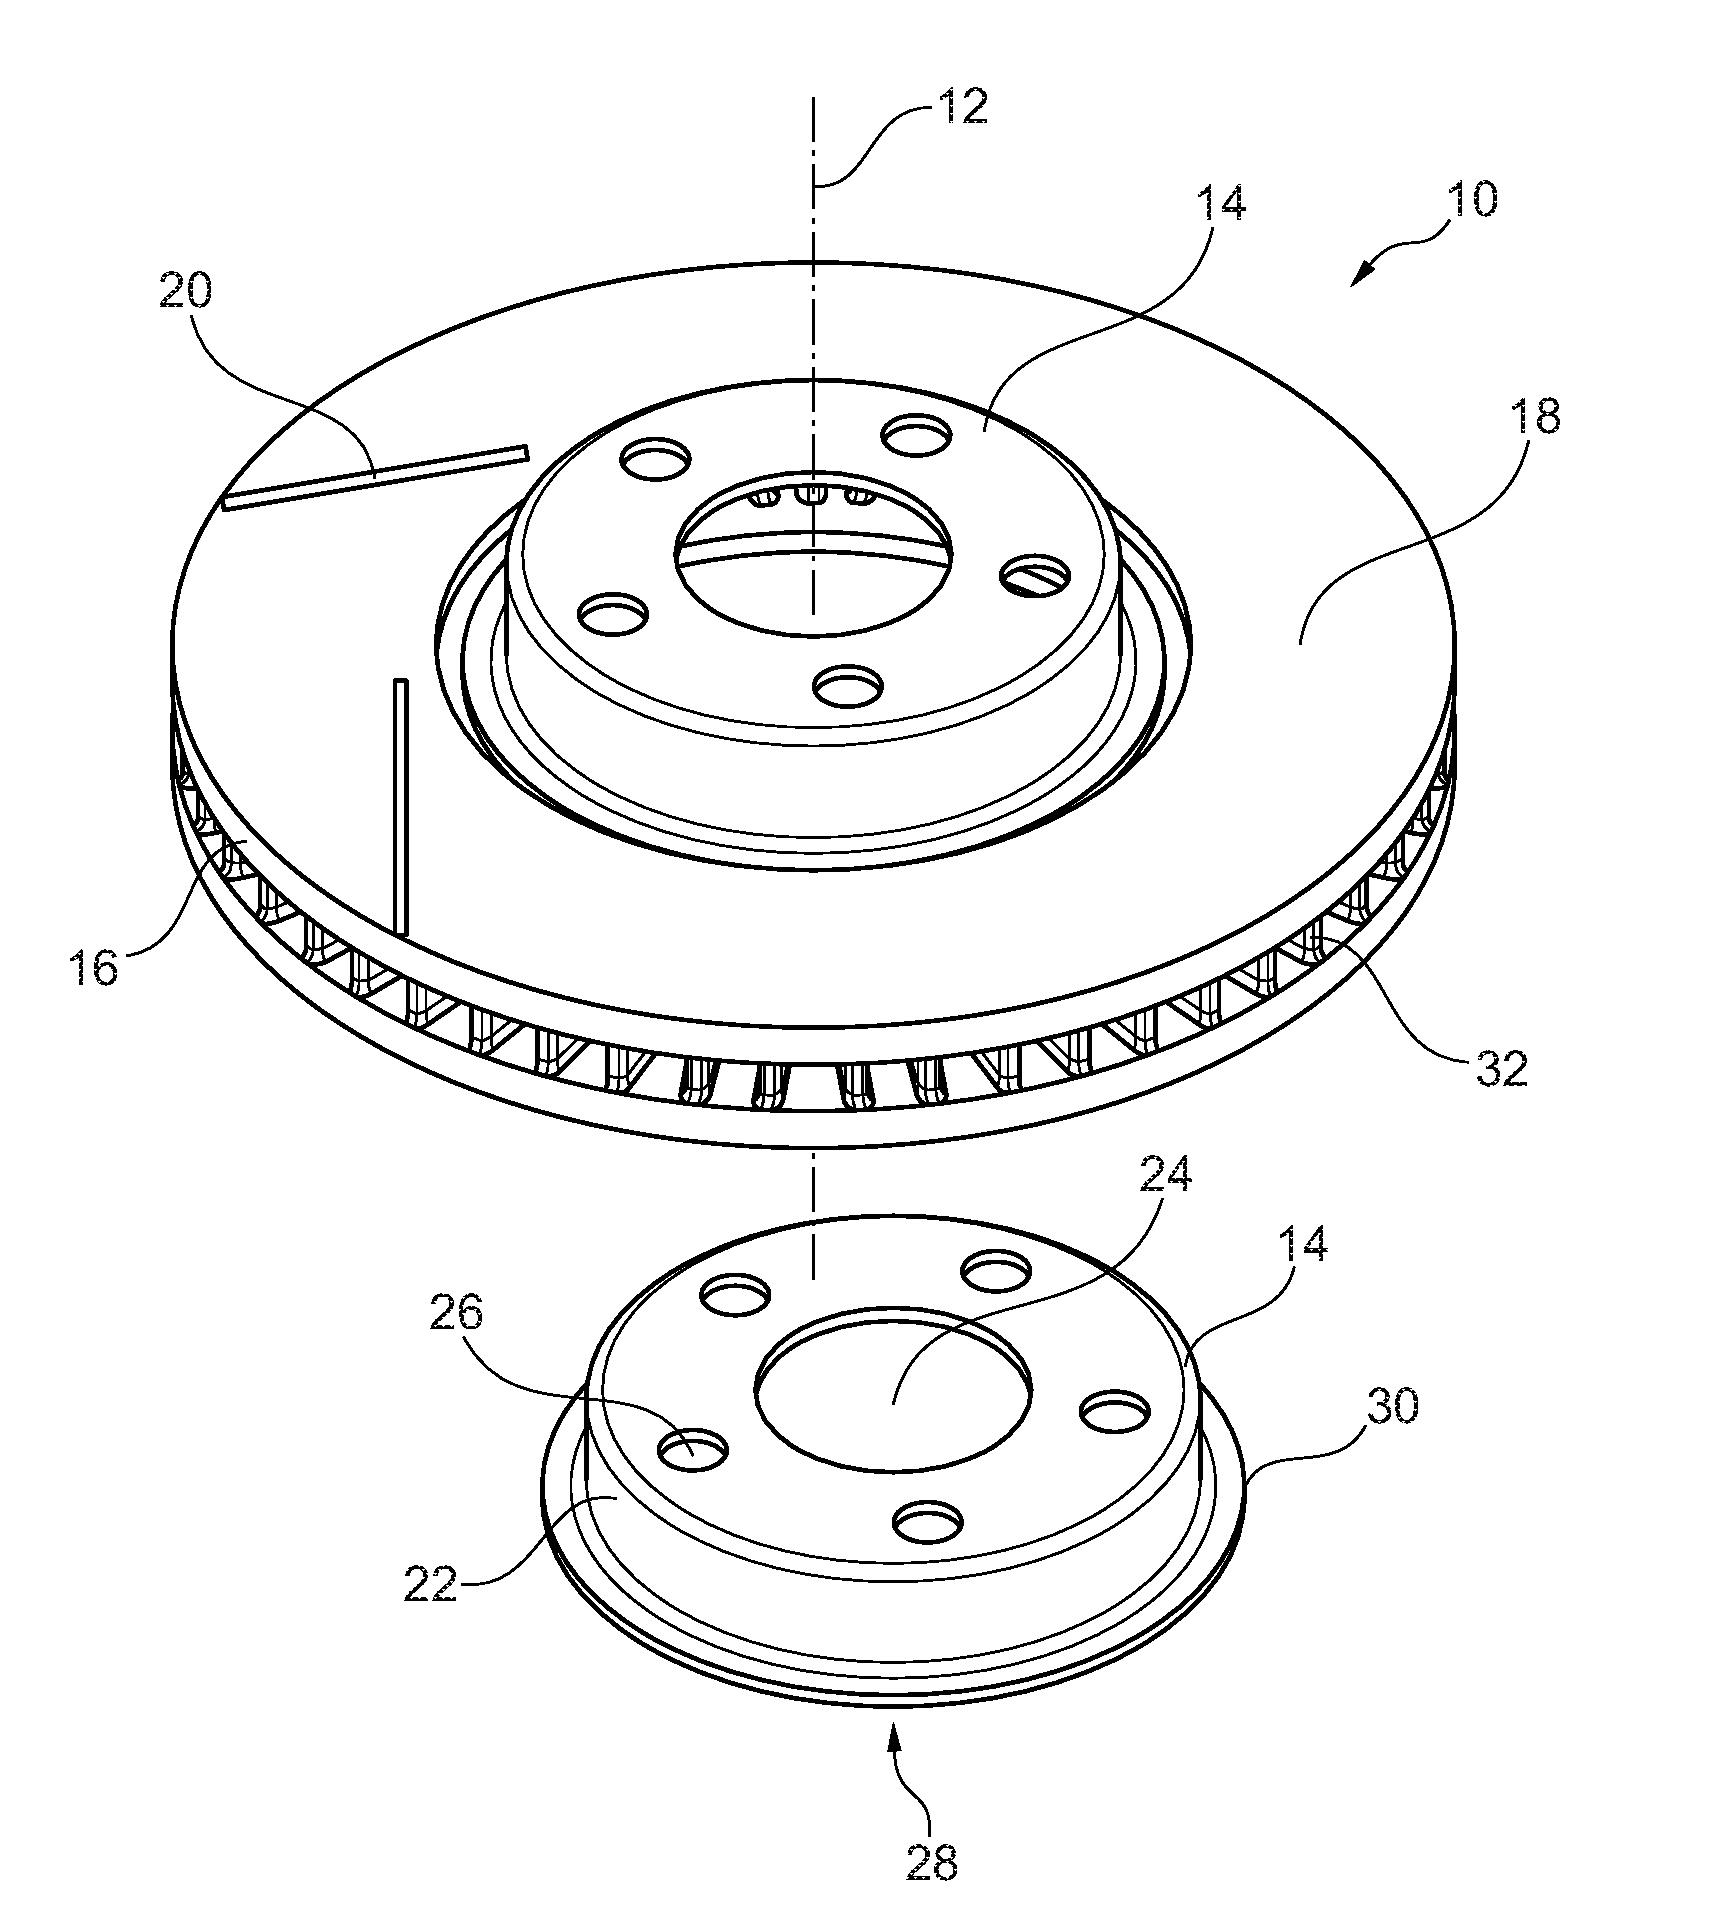 Ford Files Patent For Brake Disk 3d Printing Method Brakes Diagram Industry